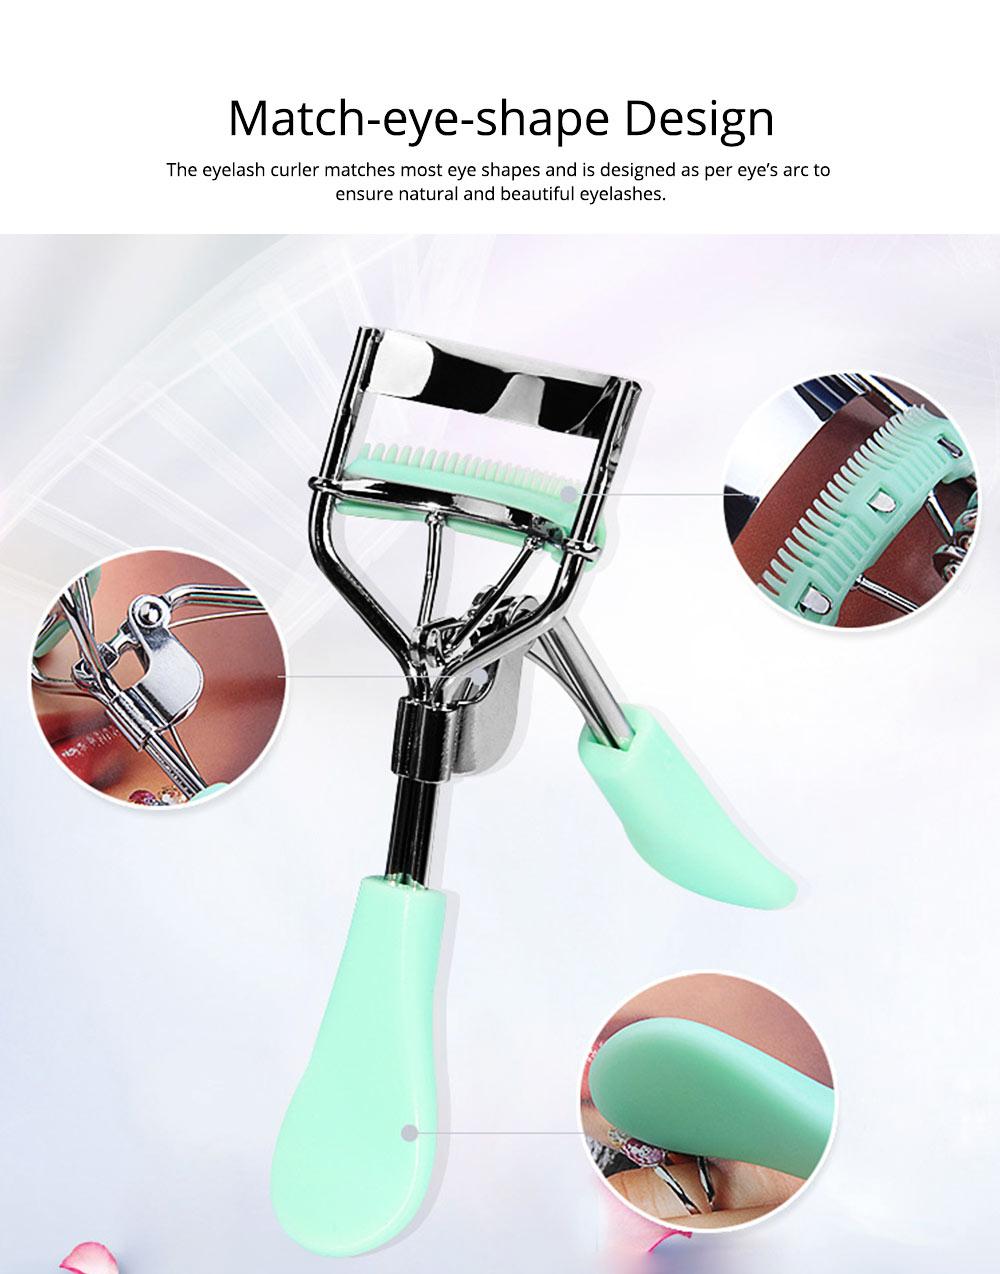 Eyelash Curler with Comb for Beauty Makeup Stainless Steel Eyelash Curler Eyebrow Trimmer Eyebrow Tweezer Beauty Makeup Tools 3